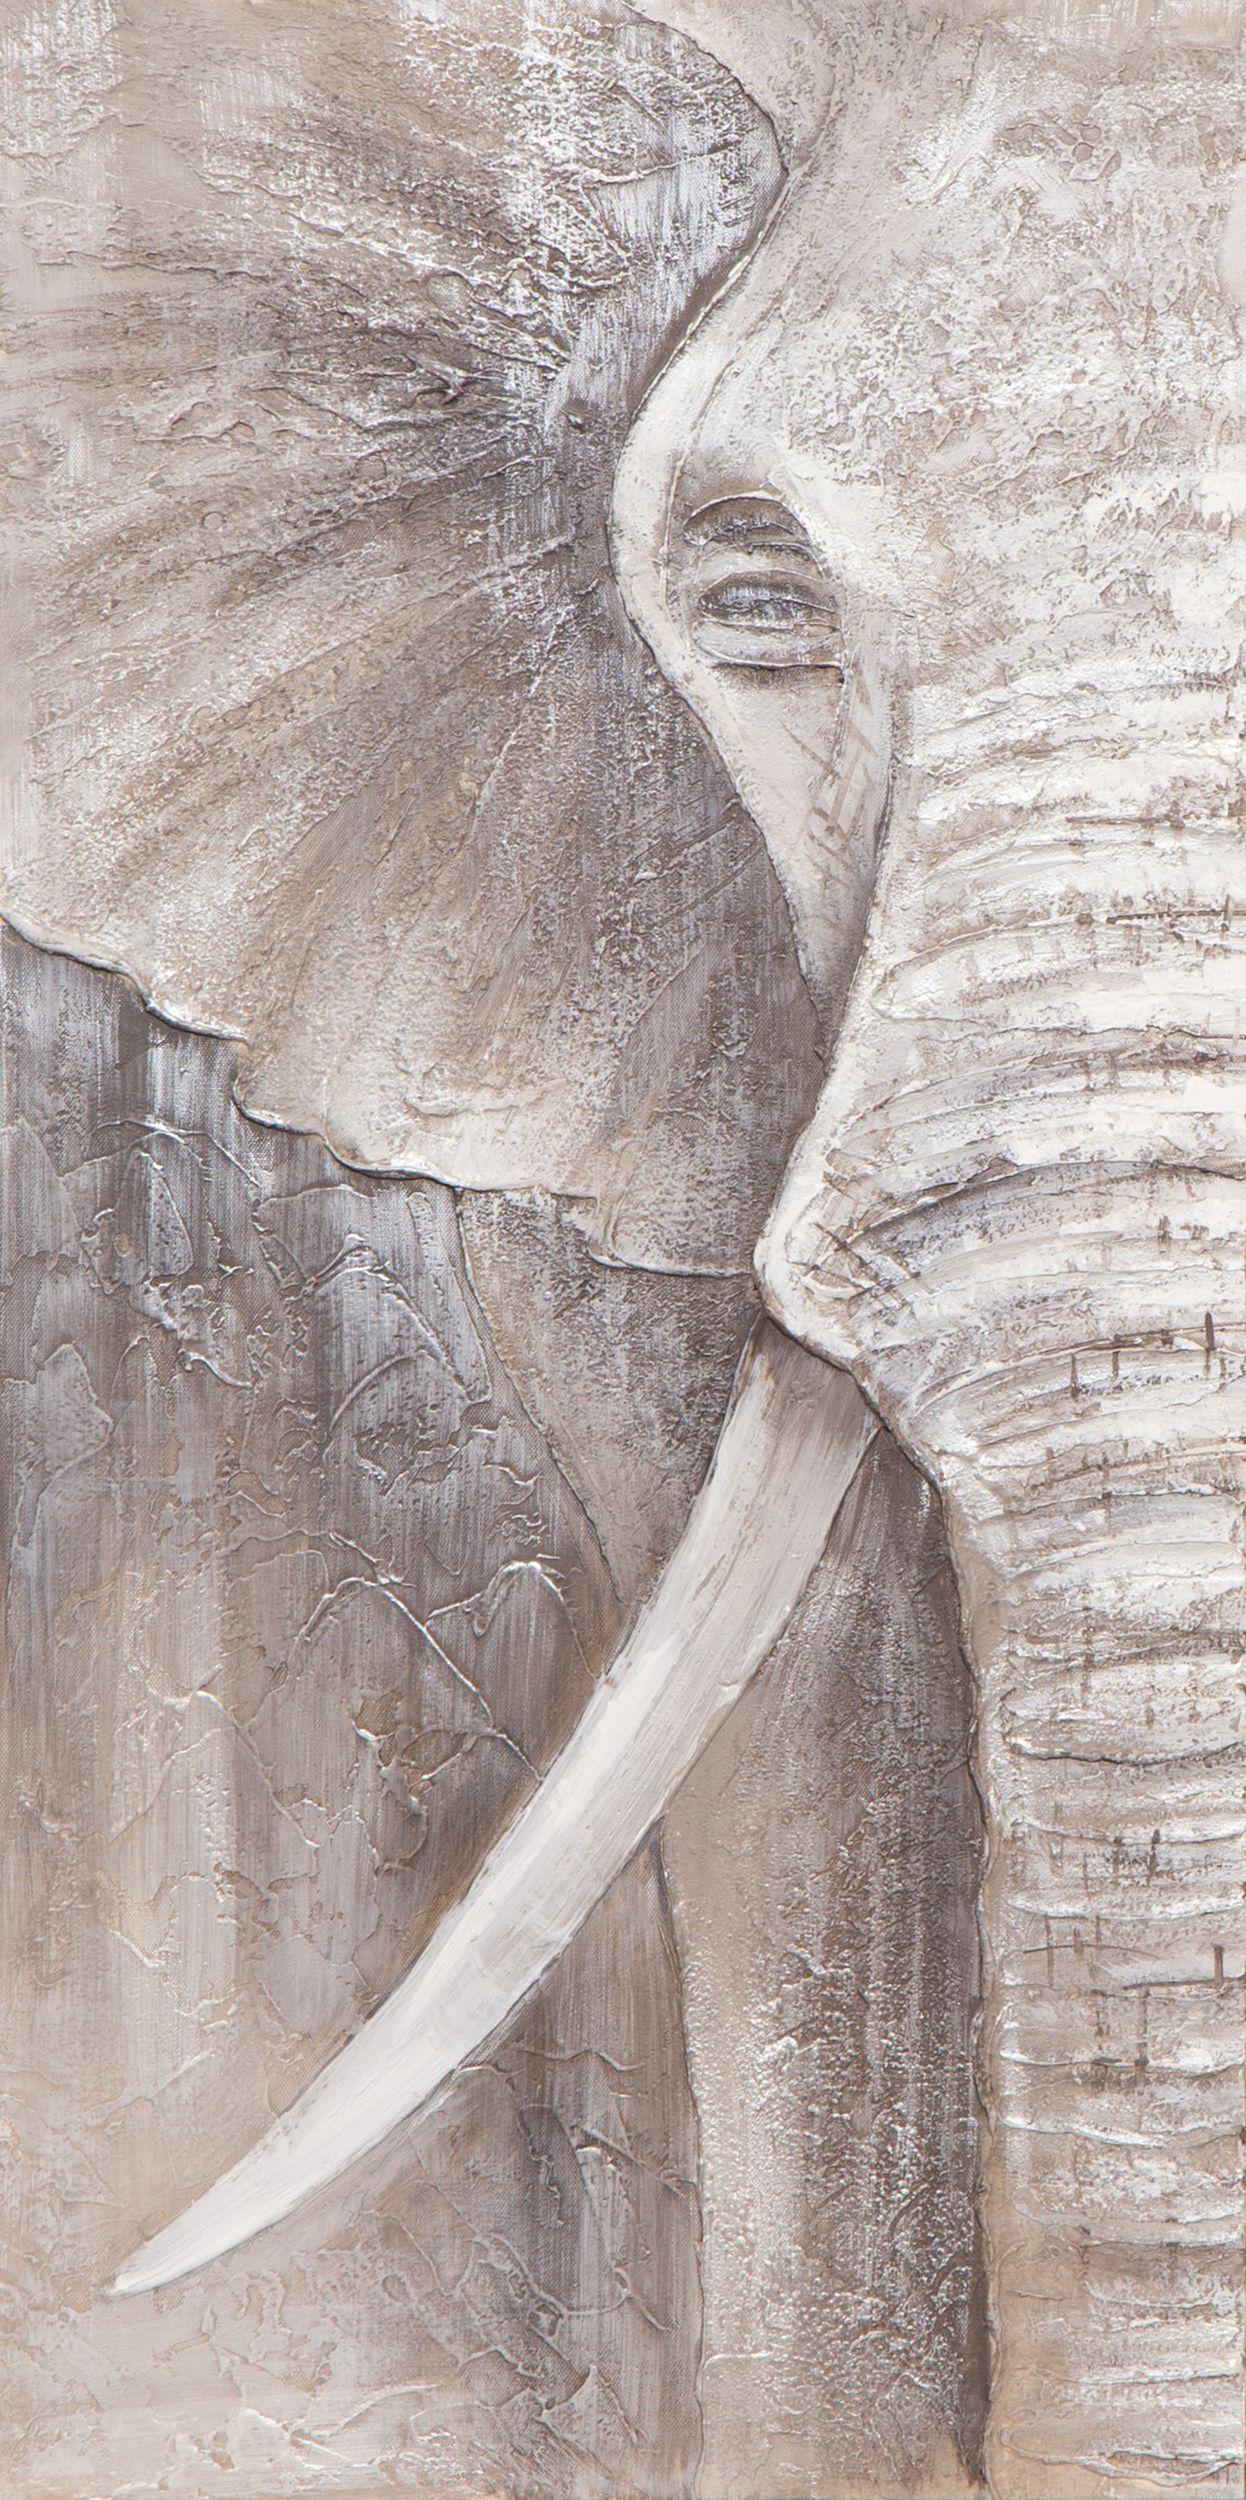 Leinwandbild 40x80cm ORIGINAL NESTO, ELEPHANT